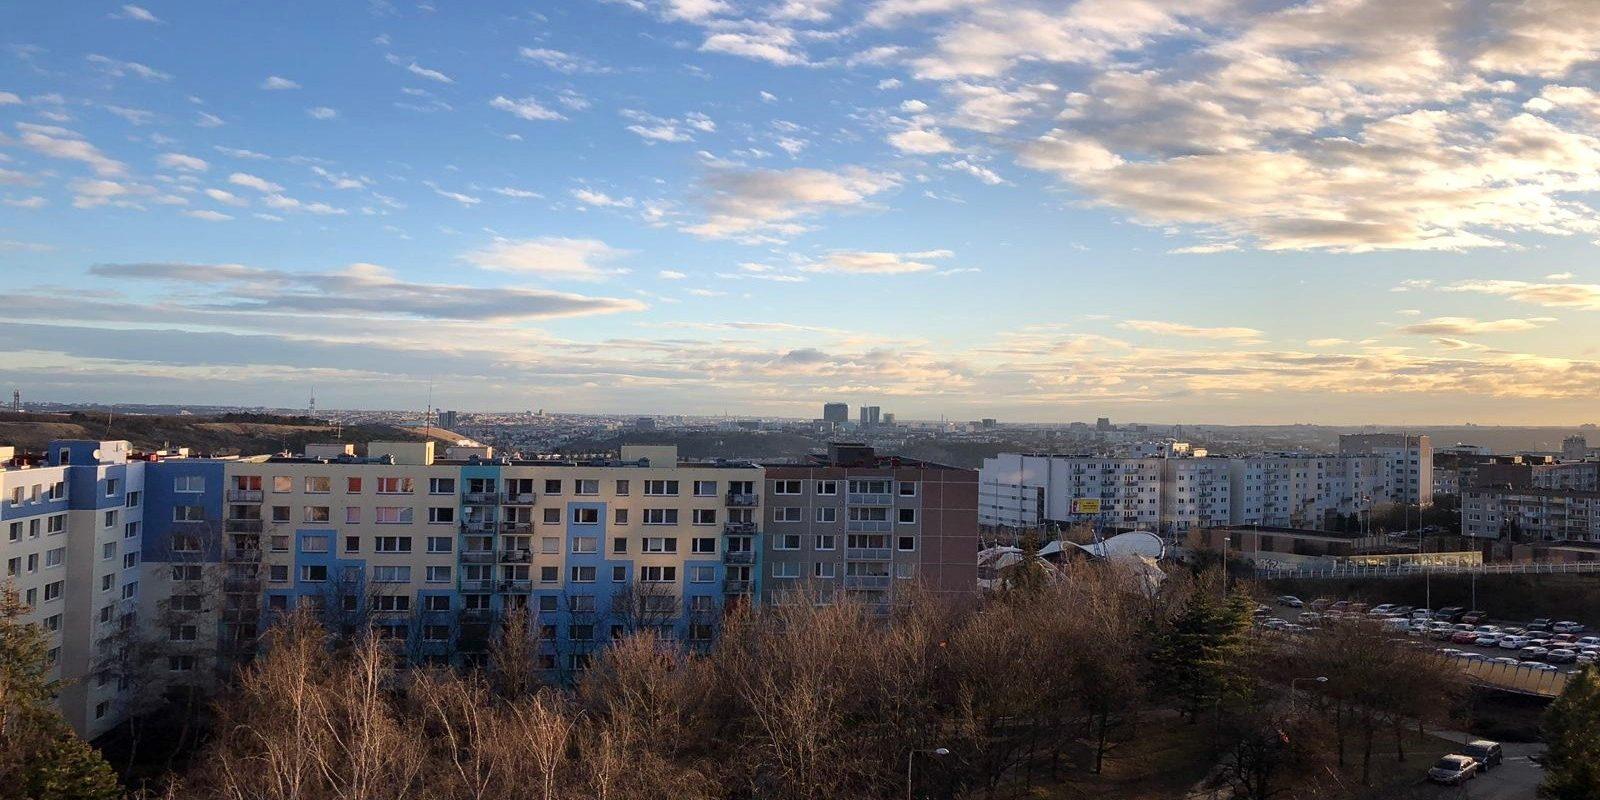 Pronájem bytu 3+1 80 m²/Lodžie, Hlubočepy.